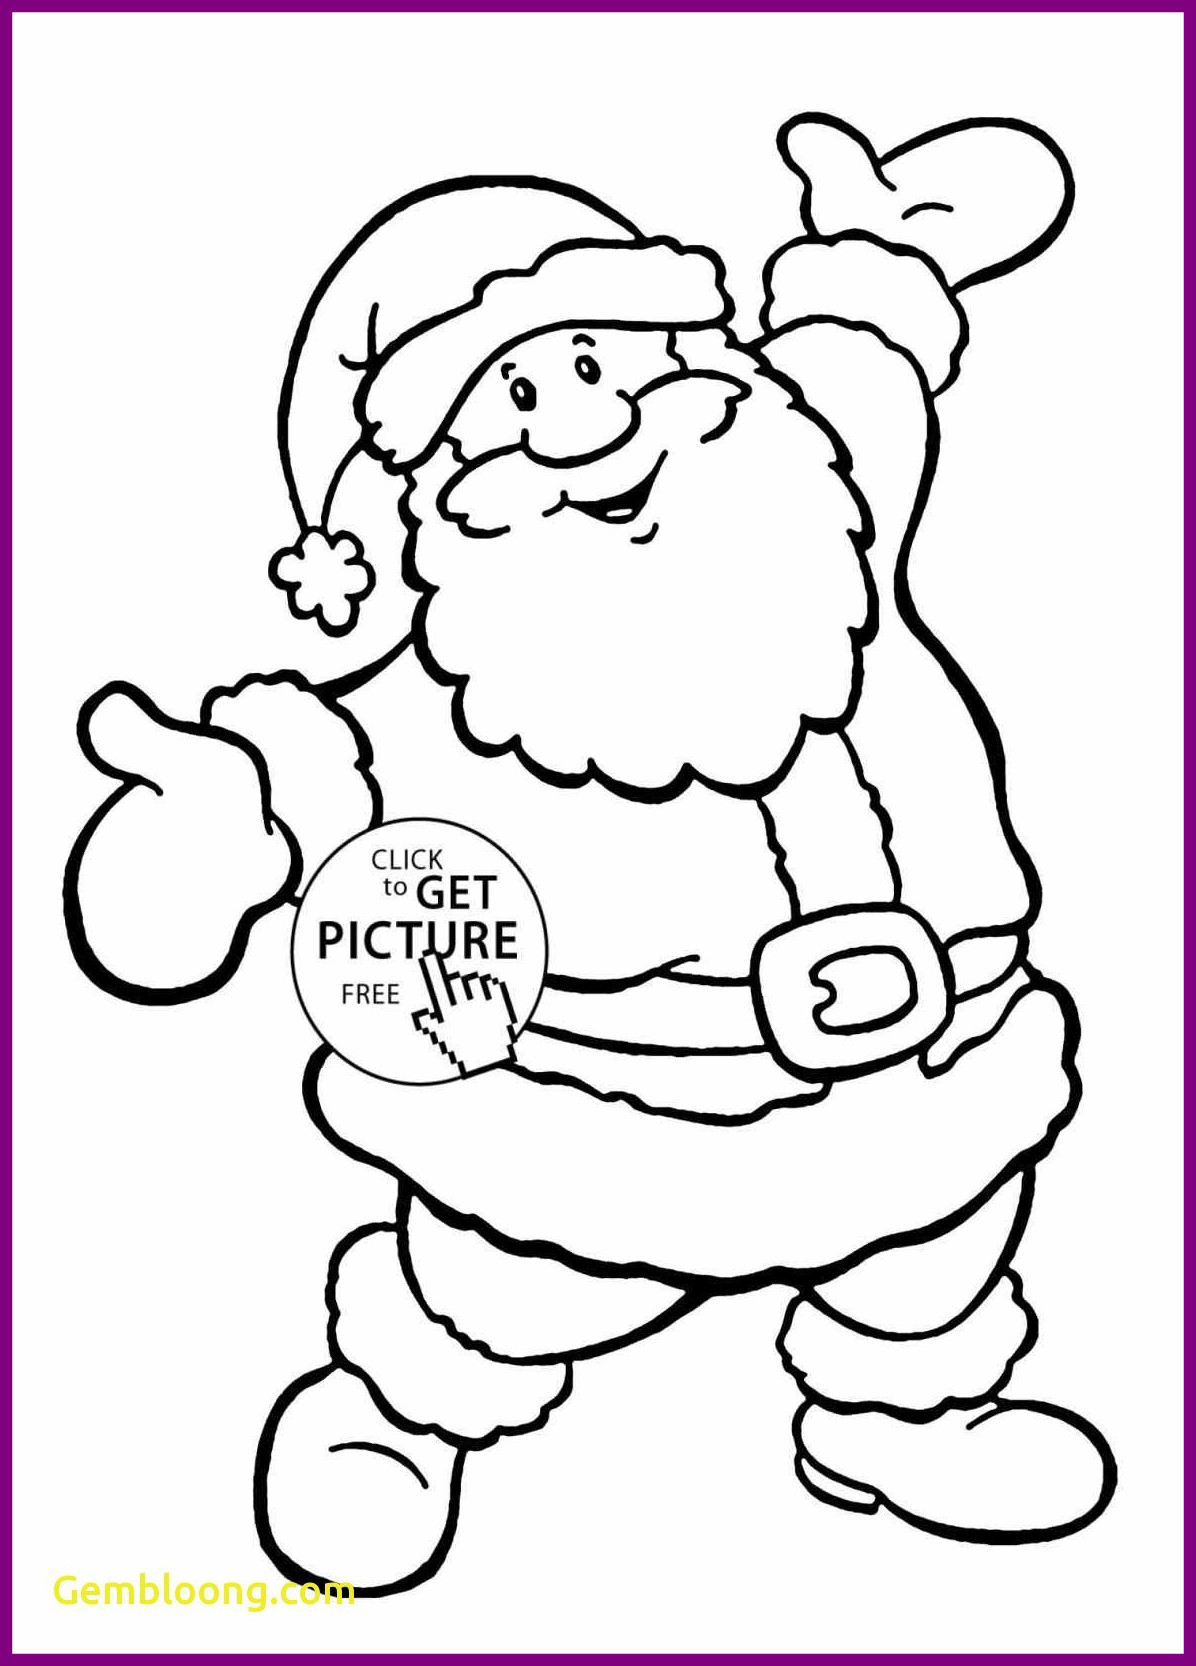 Santa And Rudolph Coloring Pages at GetDrawings | Free ...